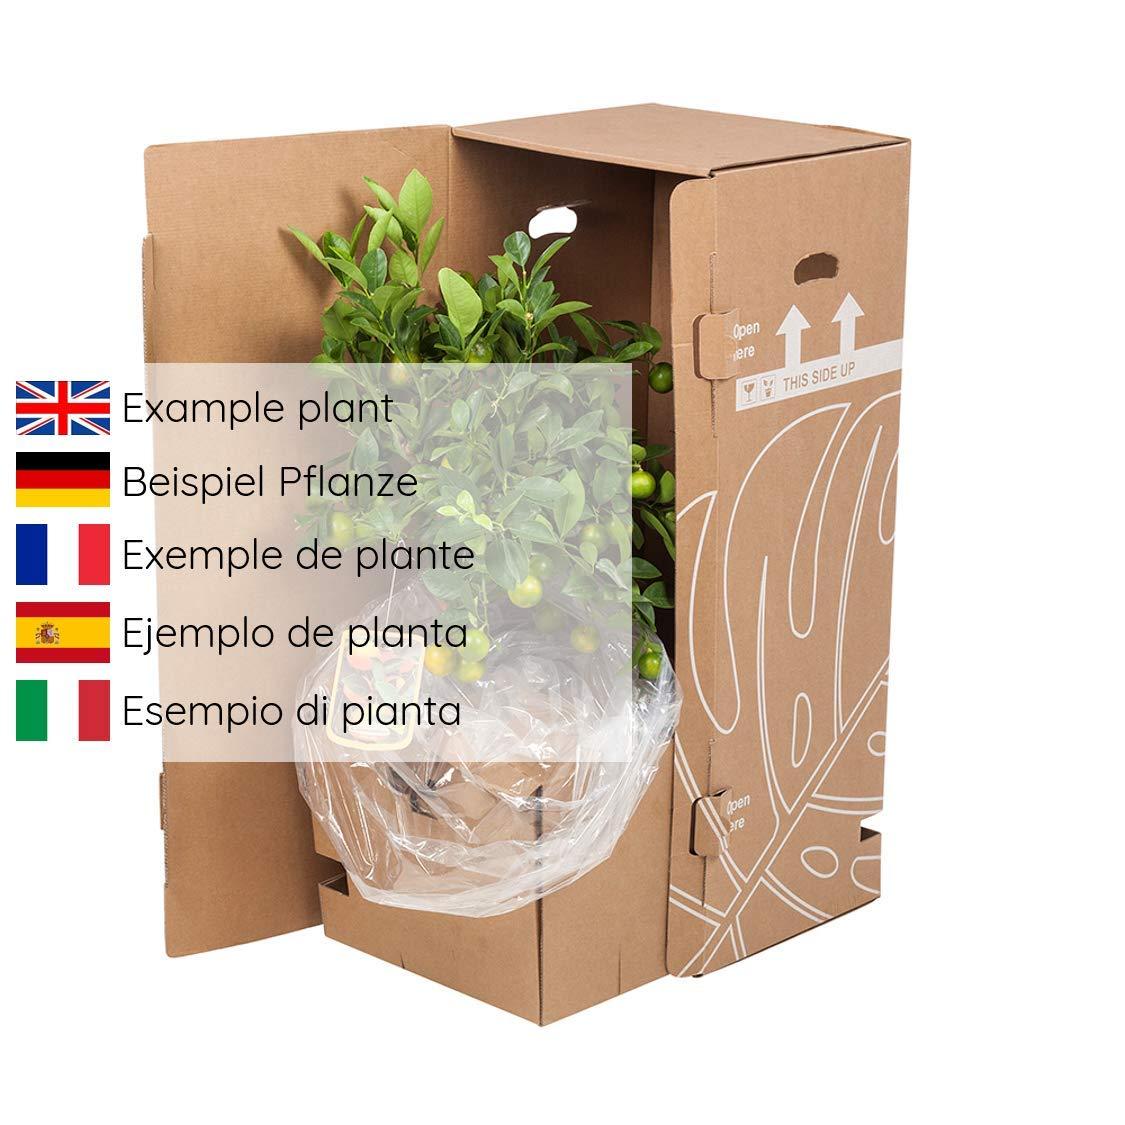 Vides de Botanicly – 4 × Clematis olympia – Altura: 70 cm: Amazon.es: Jardín